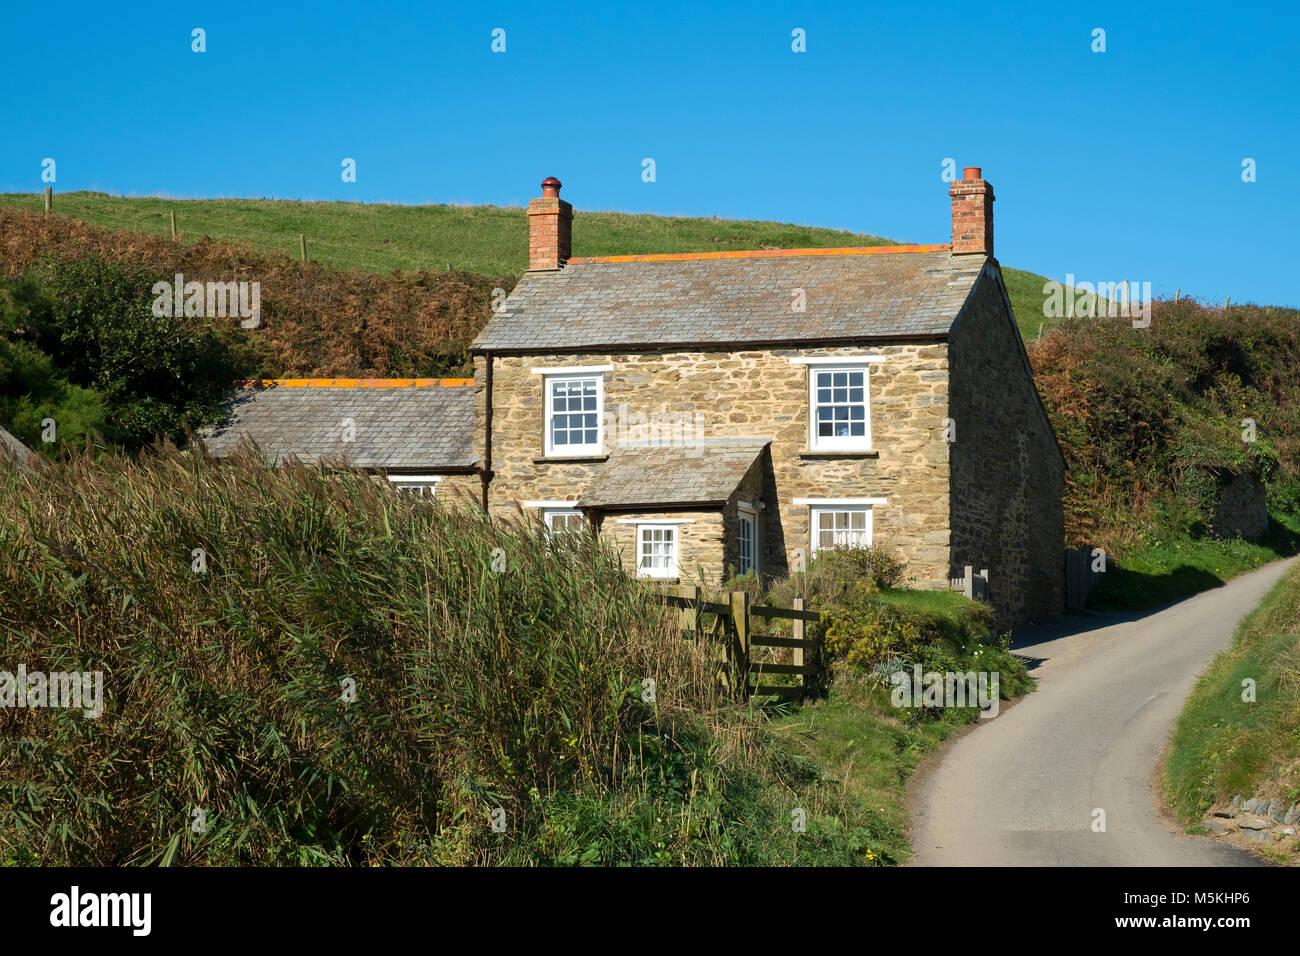 granite stone cottage at hemmick in cornwall, england, uk. - Stock Image